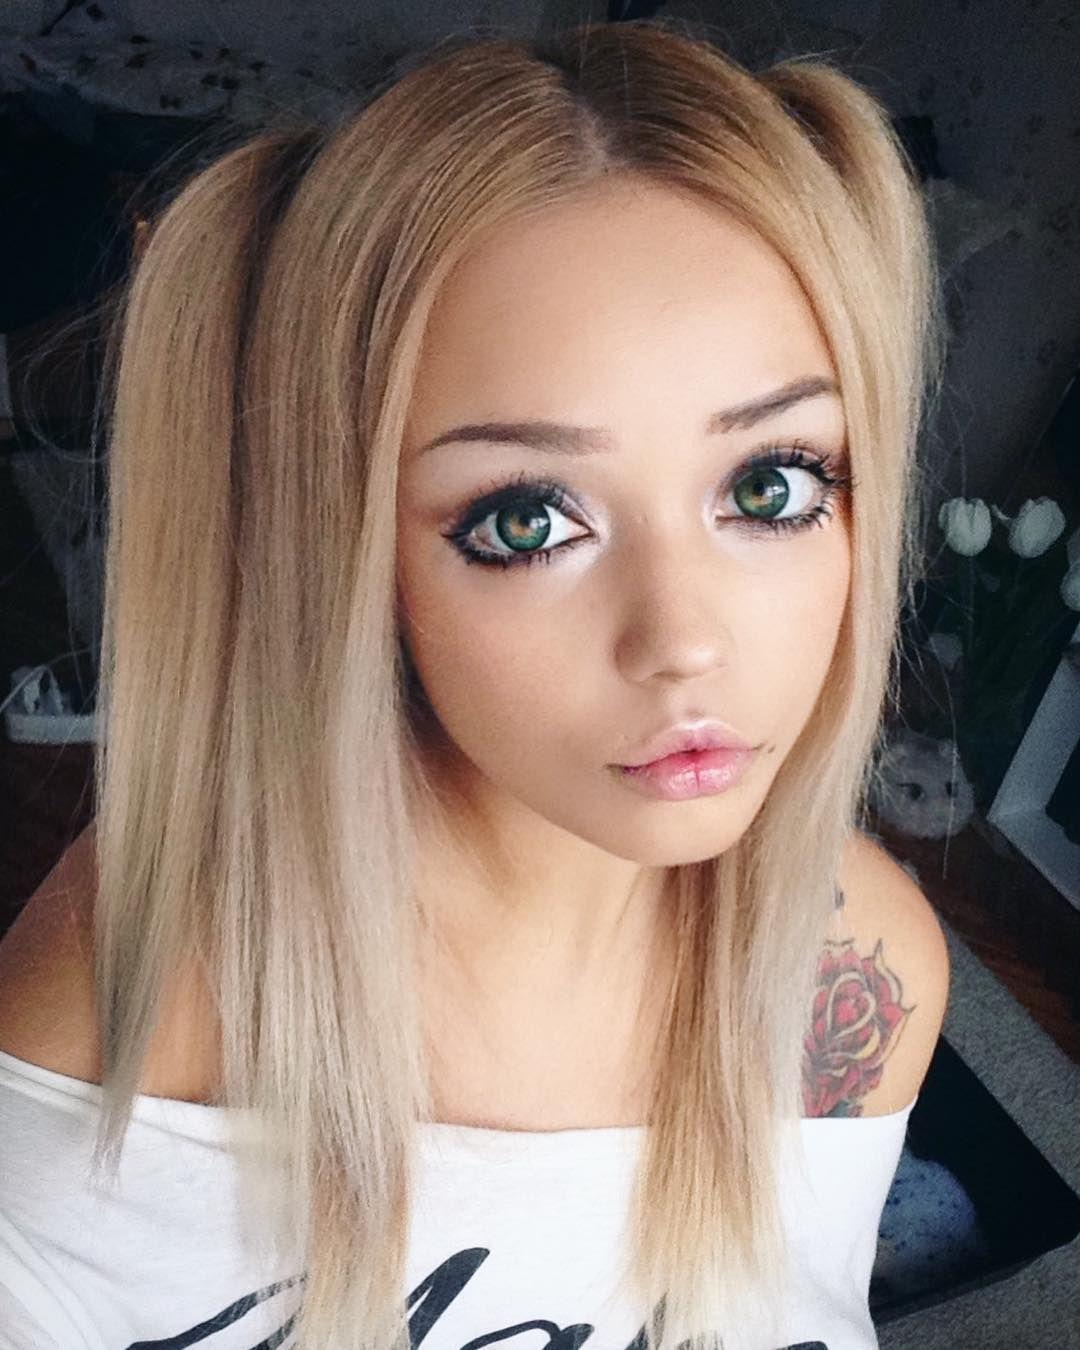 Pin By Katie Robu On Menningarnott Big Eyes Makeup Kawaii Makeup Anime Eye Makeup